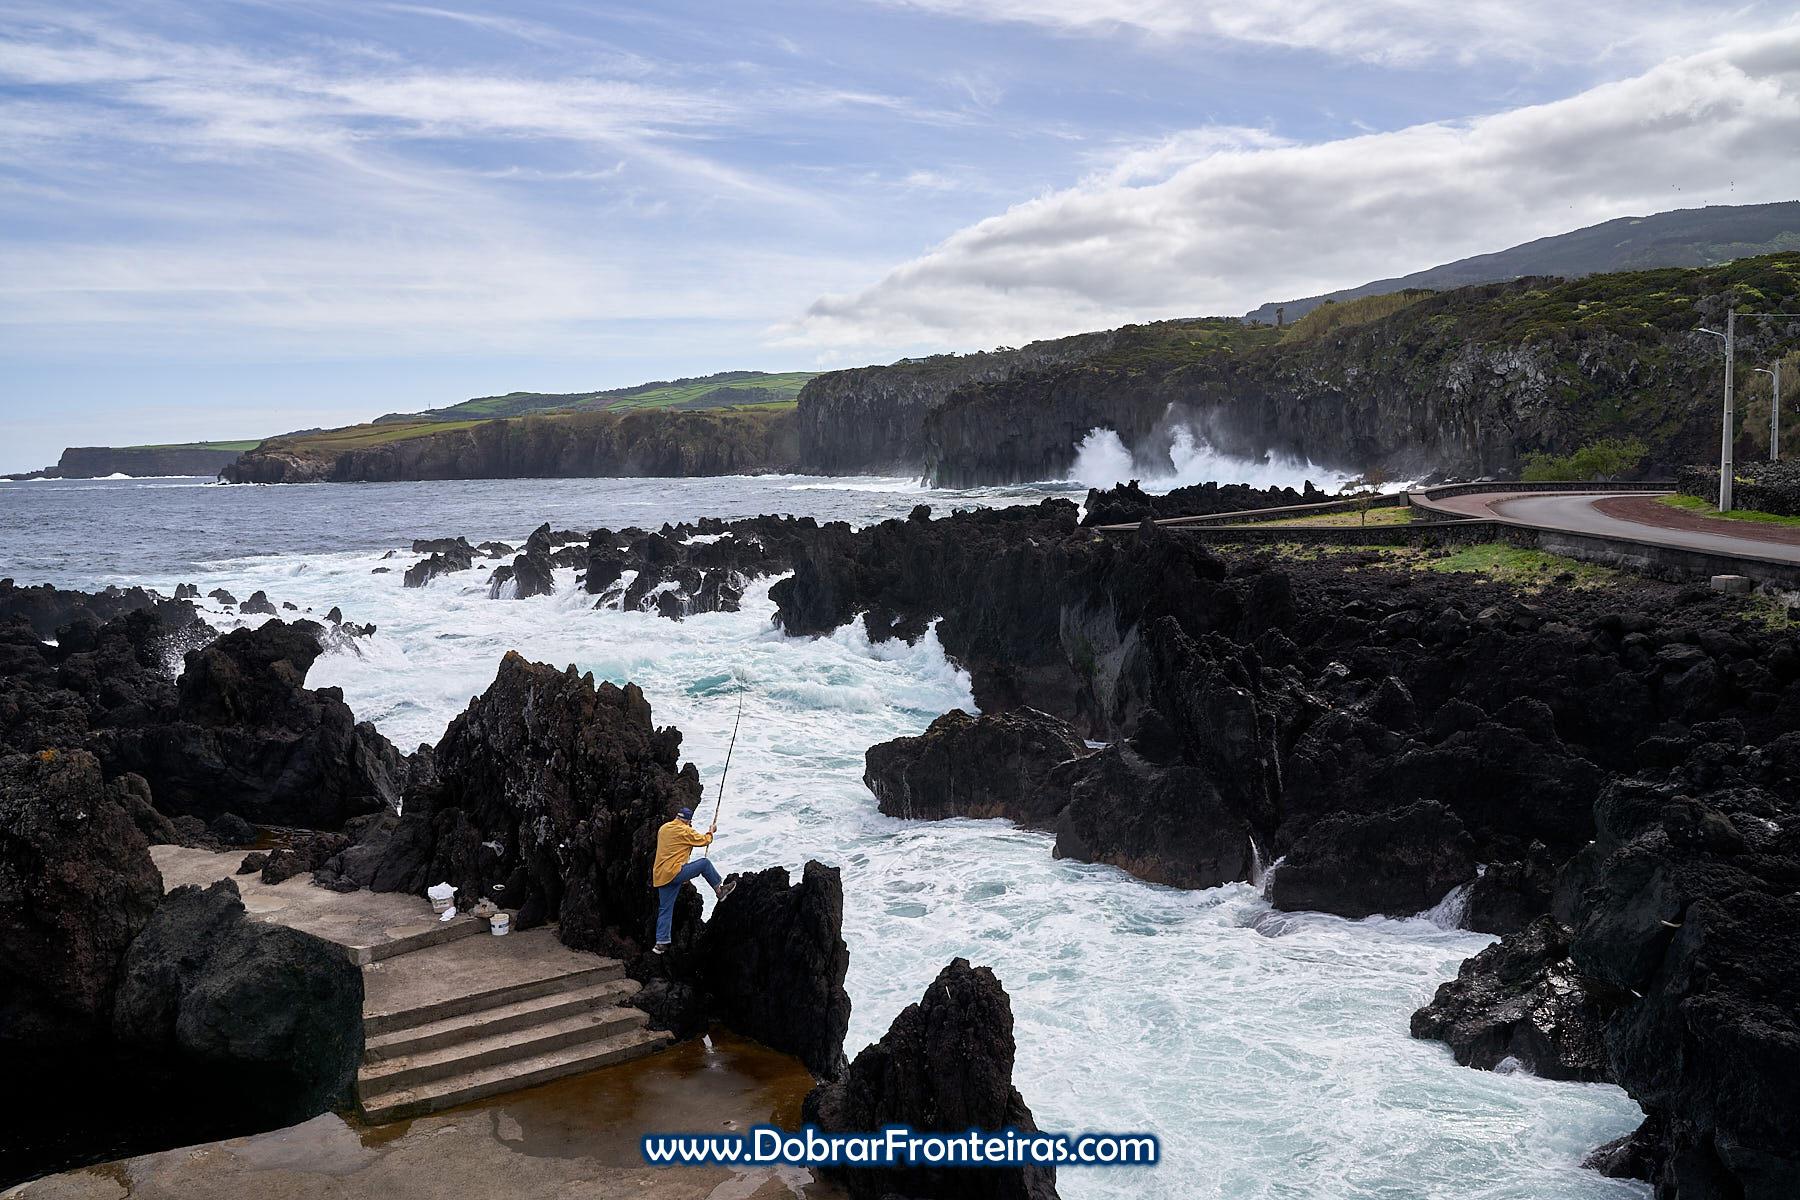 Mar agreste e pescados na ilha Terceira, Açores